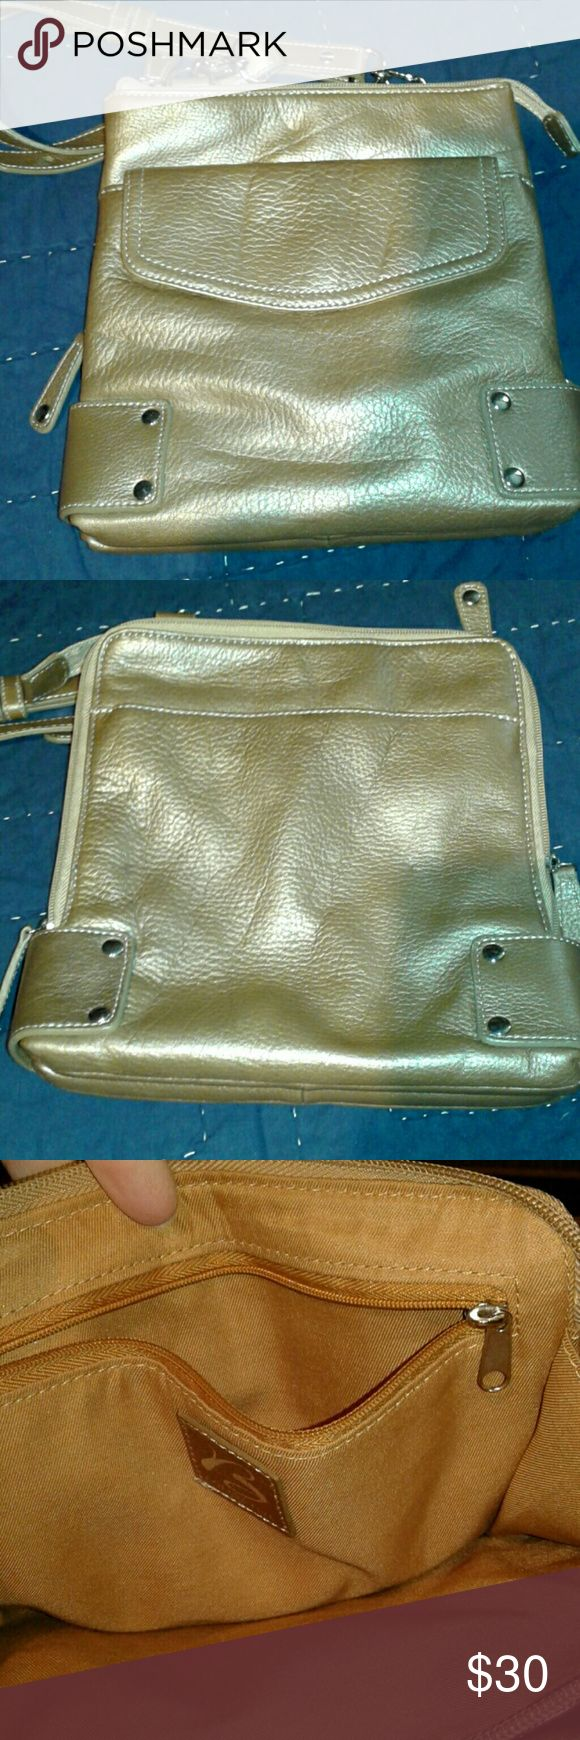 Selling this ⤵⬇⤵⤵NWOT.    B MAKOWSKI CROSSBODY BAG on Poshmark! My username is: llecroymott. #shopmycloset #poshmark #fashion #shopping #style #forsale #b. makowsky #Handbags